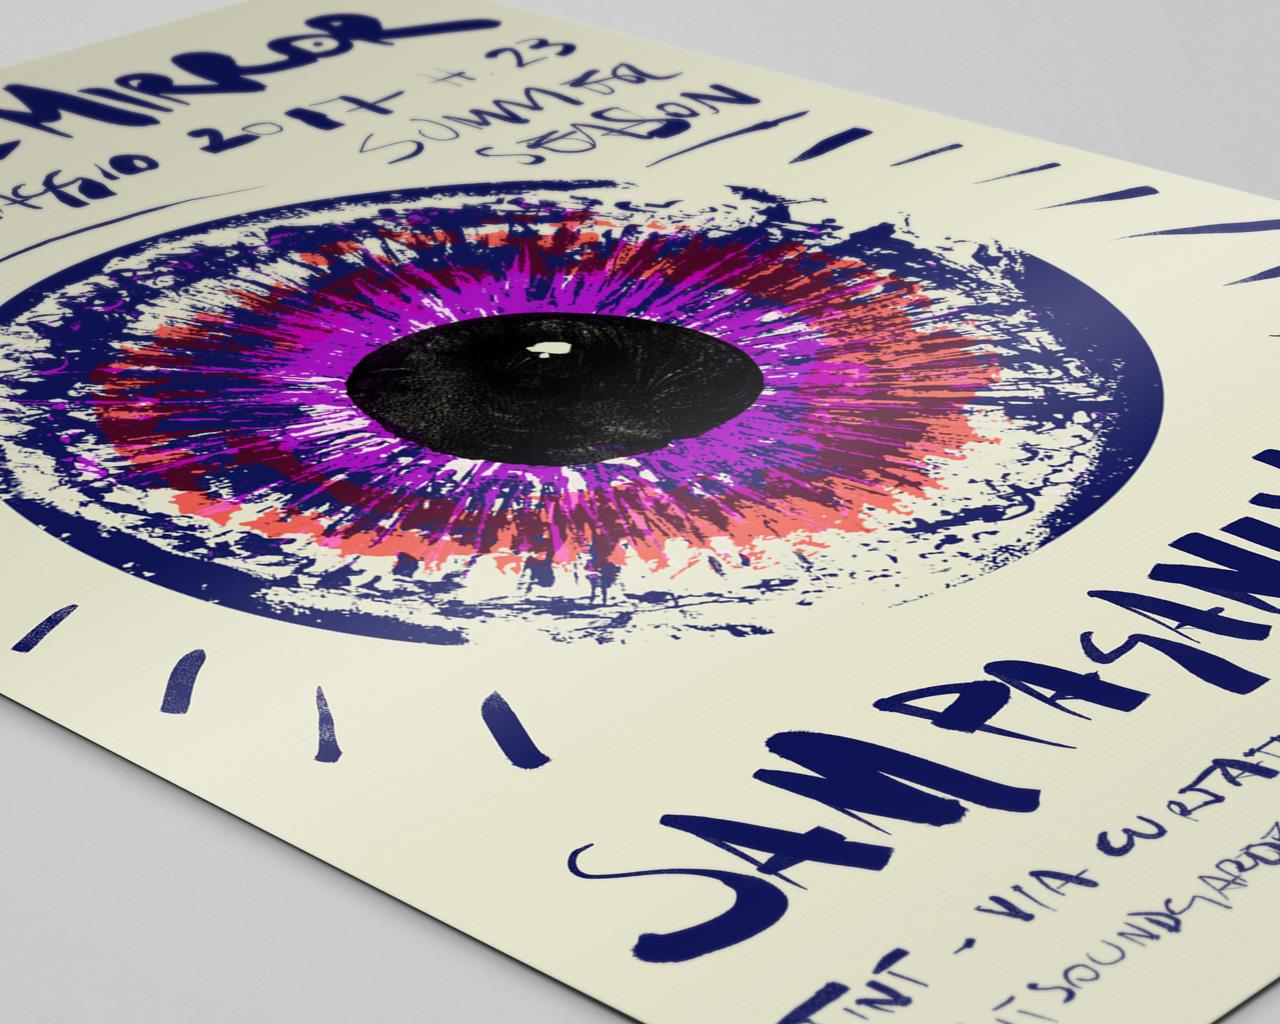 tini soul mirror graphic design 4